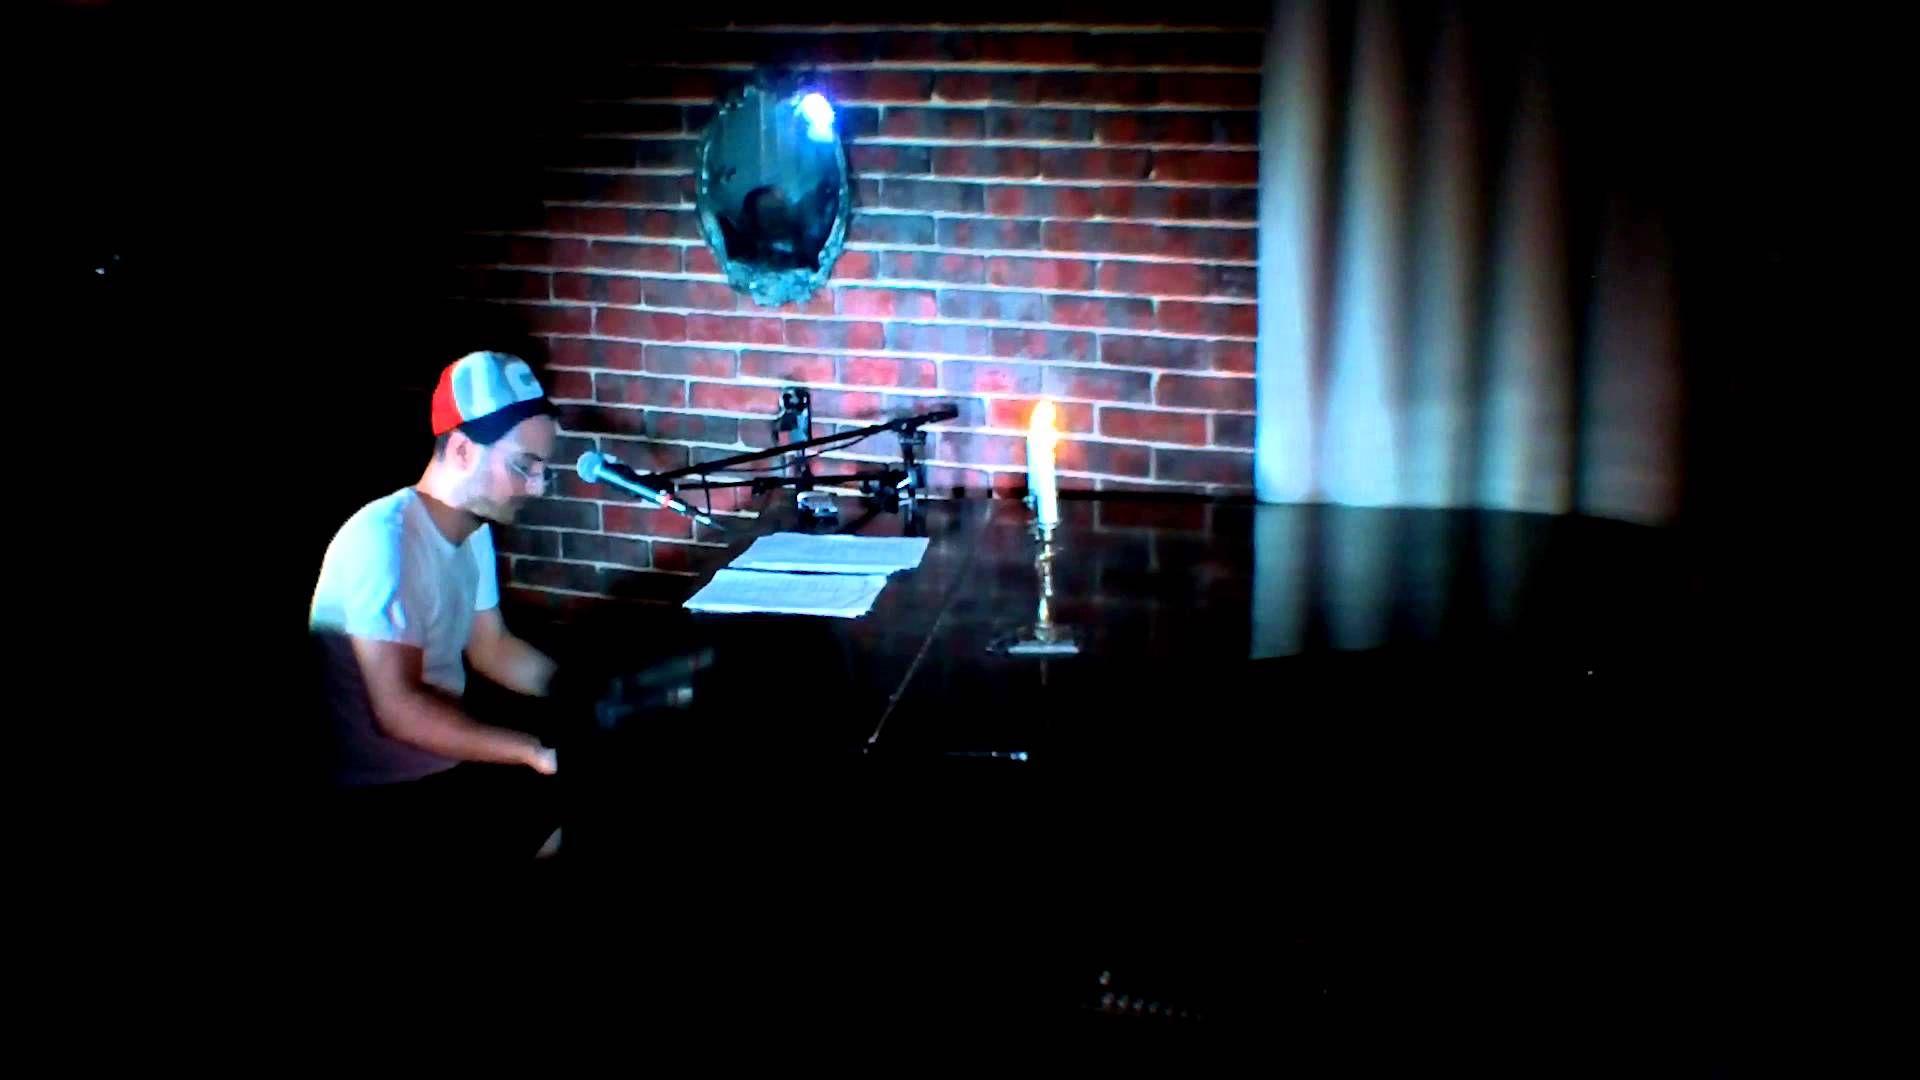 Pin On Bastian Lee Jones Videos Livingroomconcerts Berlin In living room concert